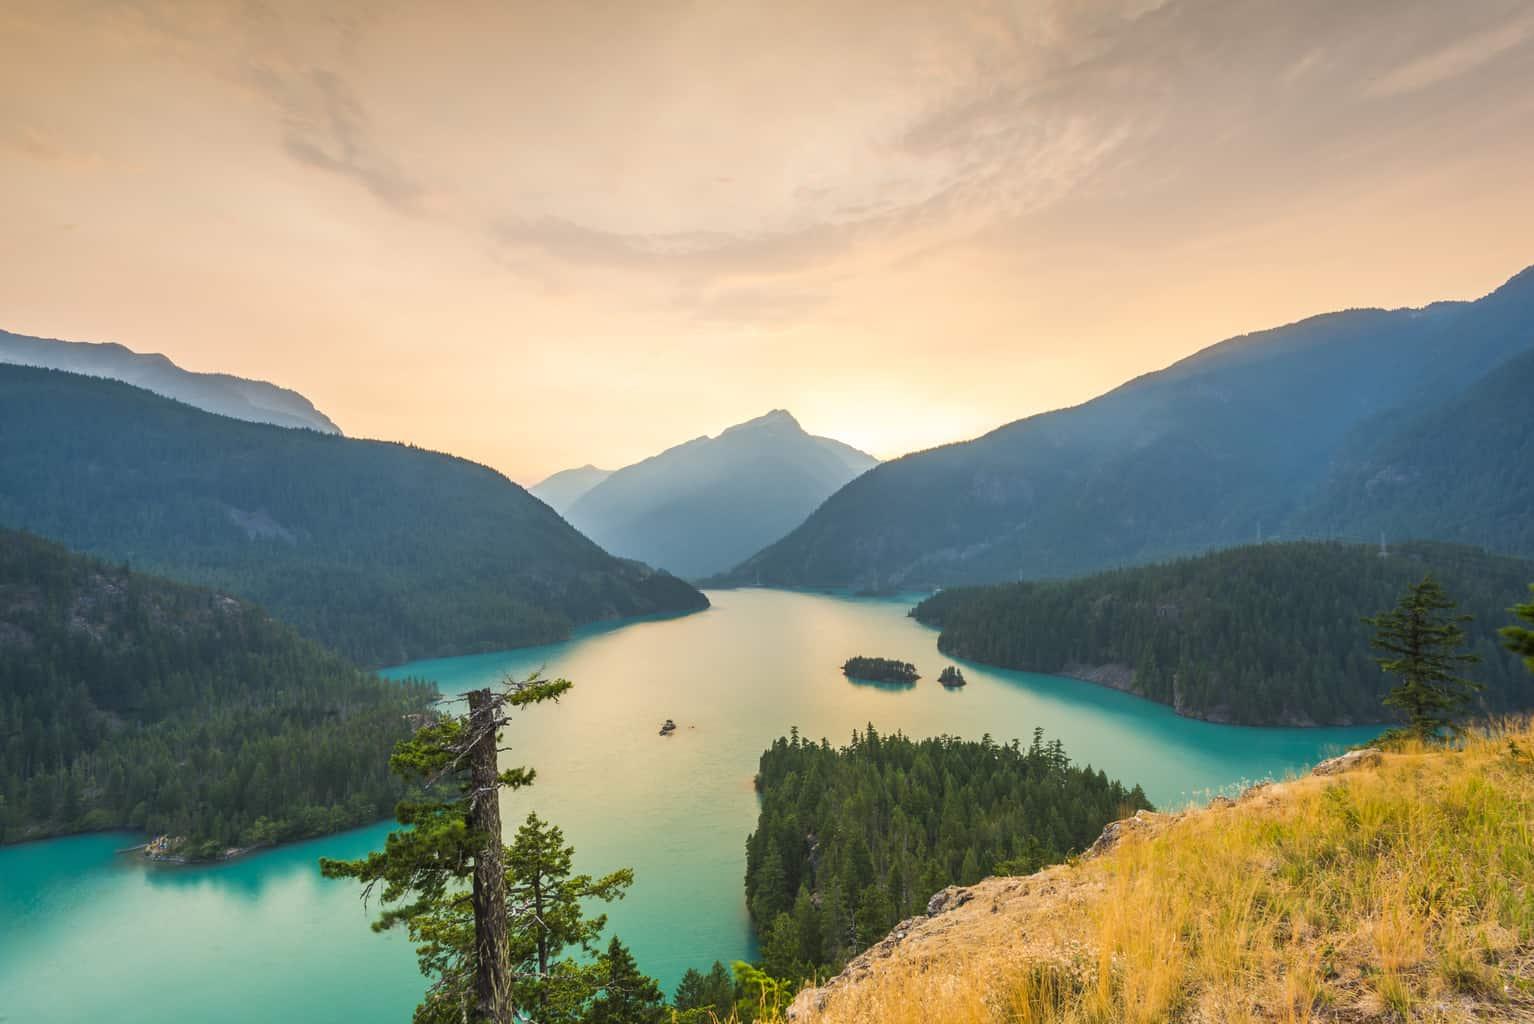 scenic sunset view of lake diablo